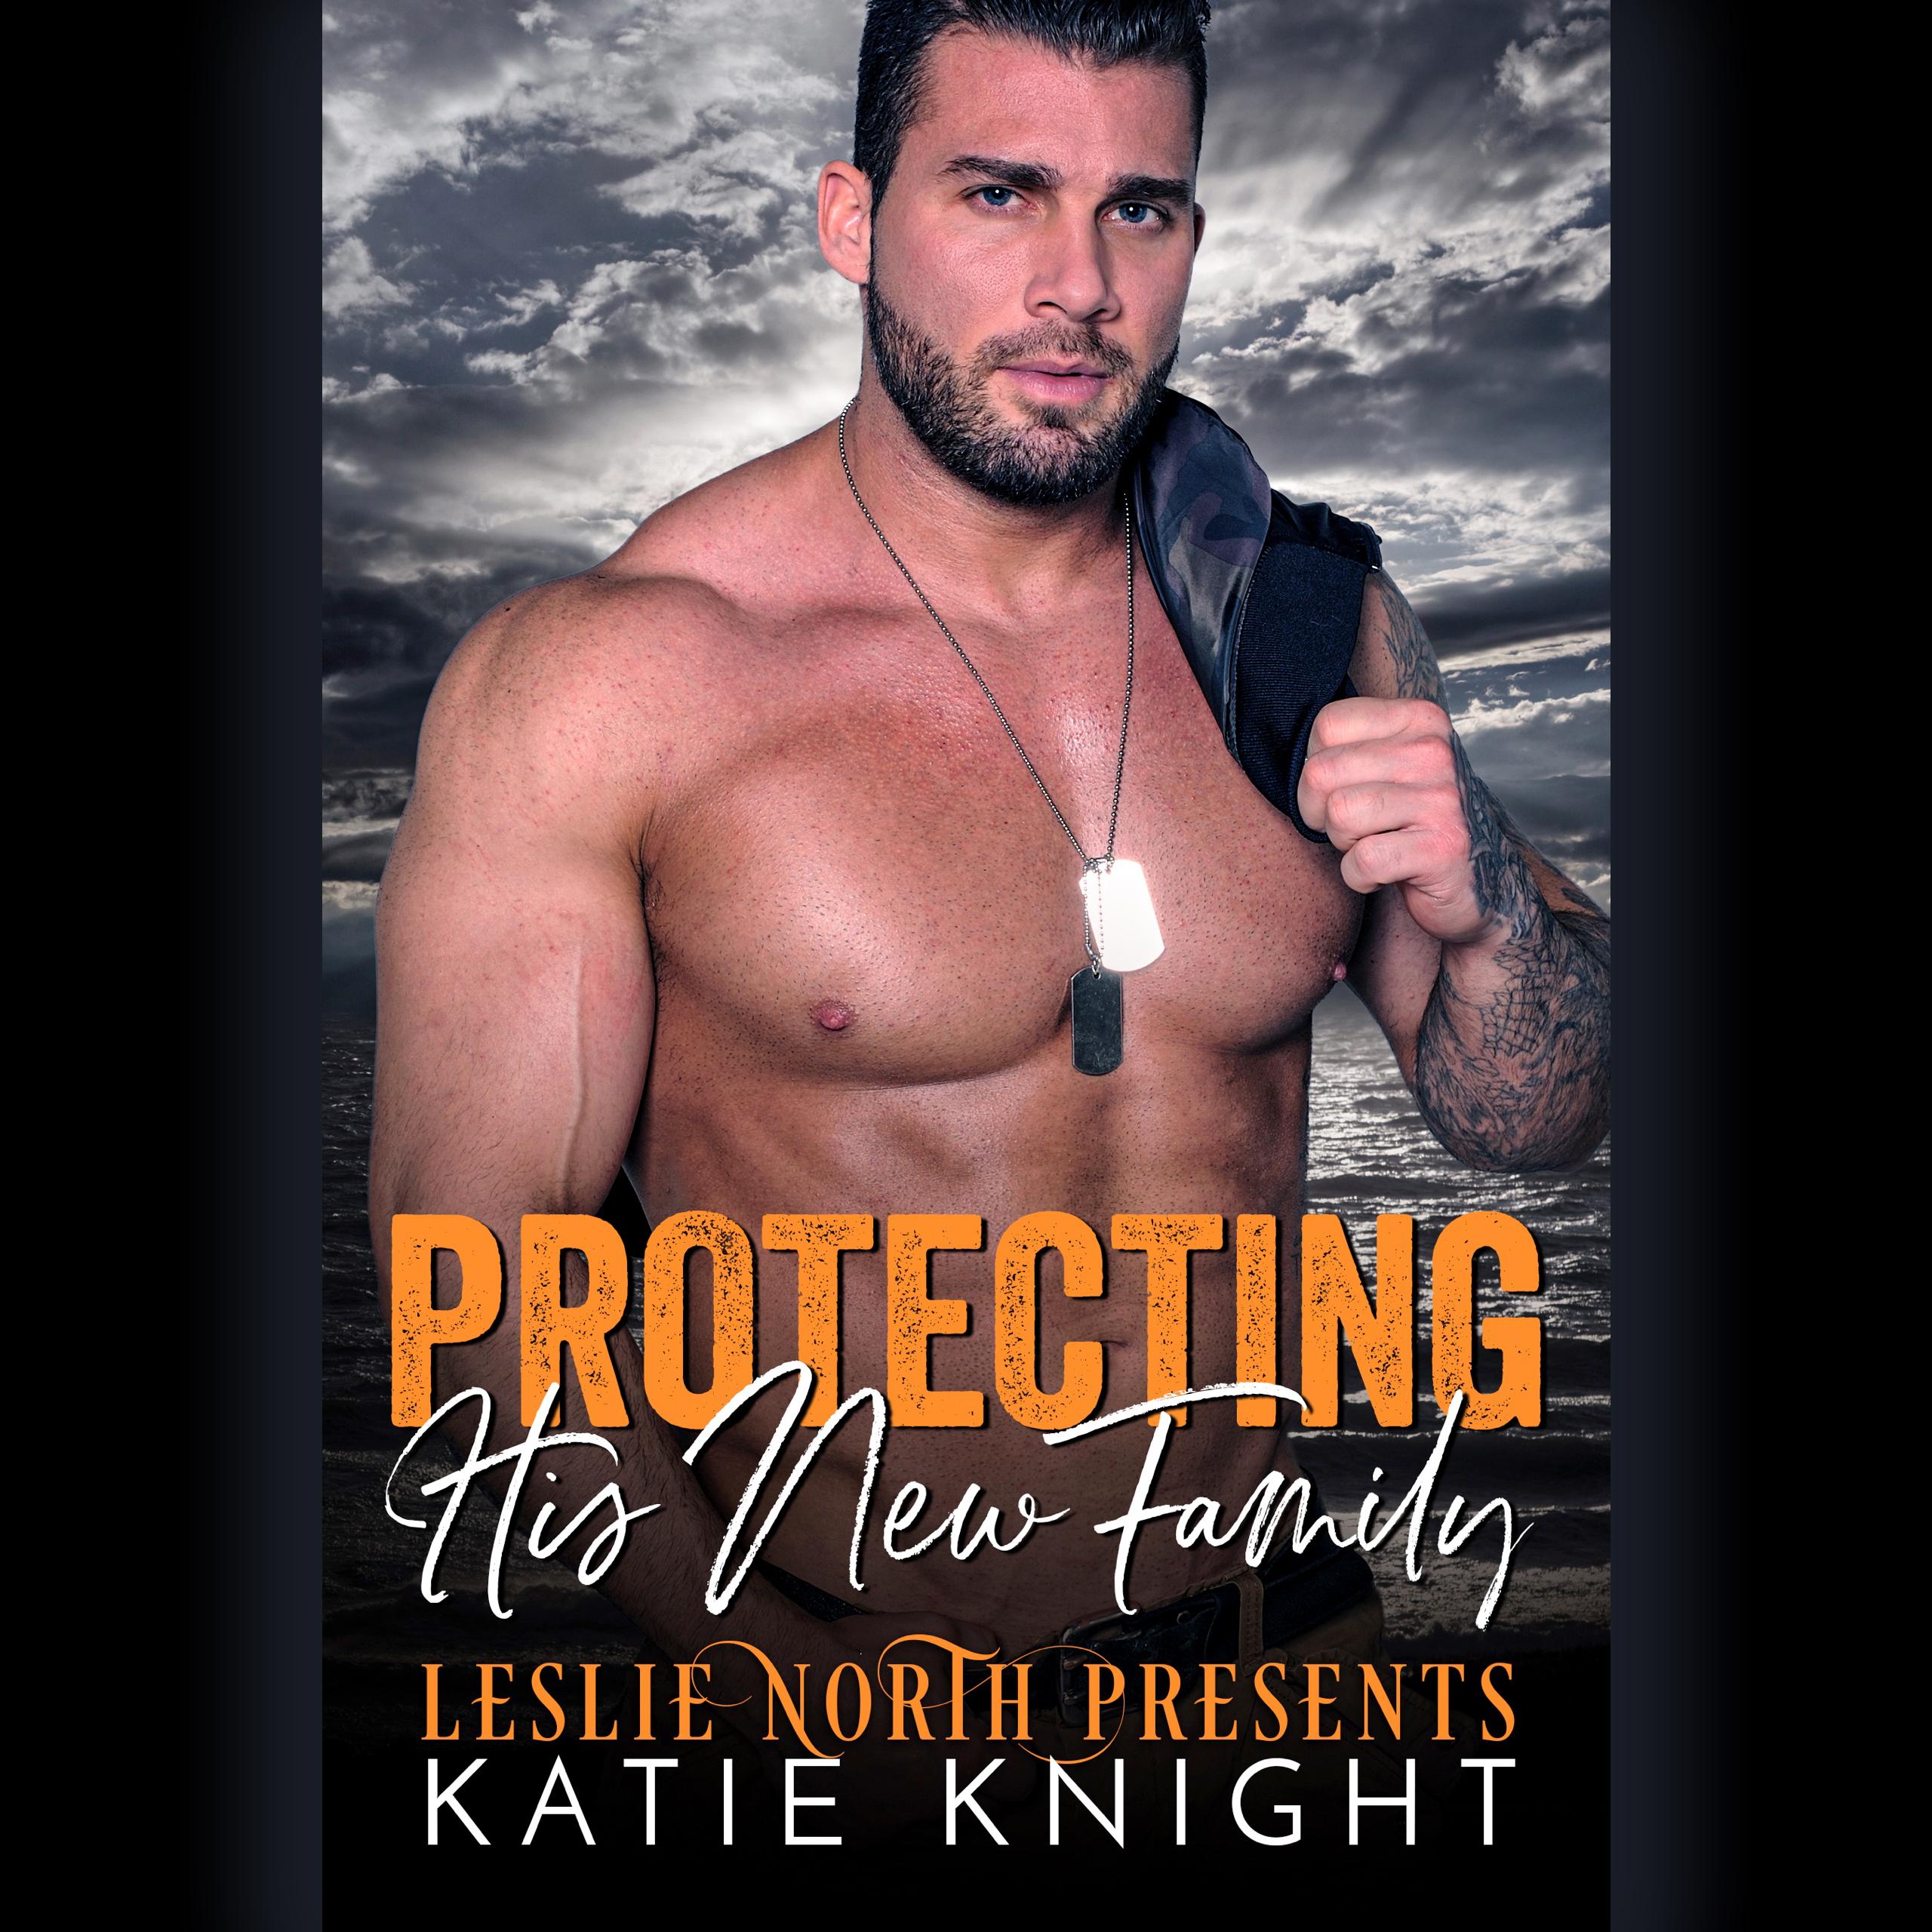 Katie Knight